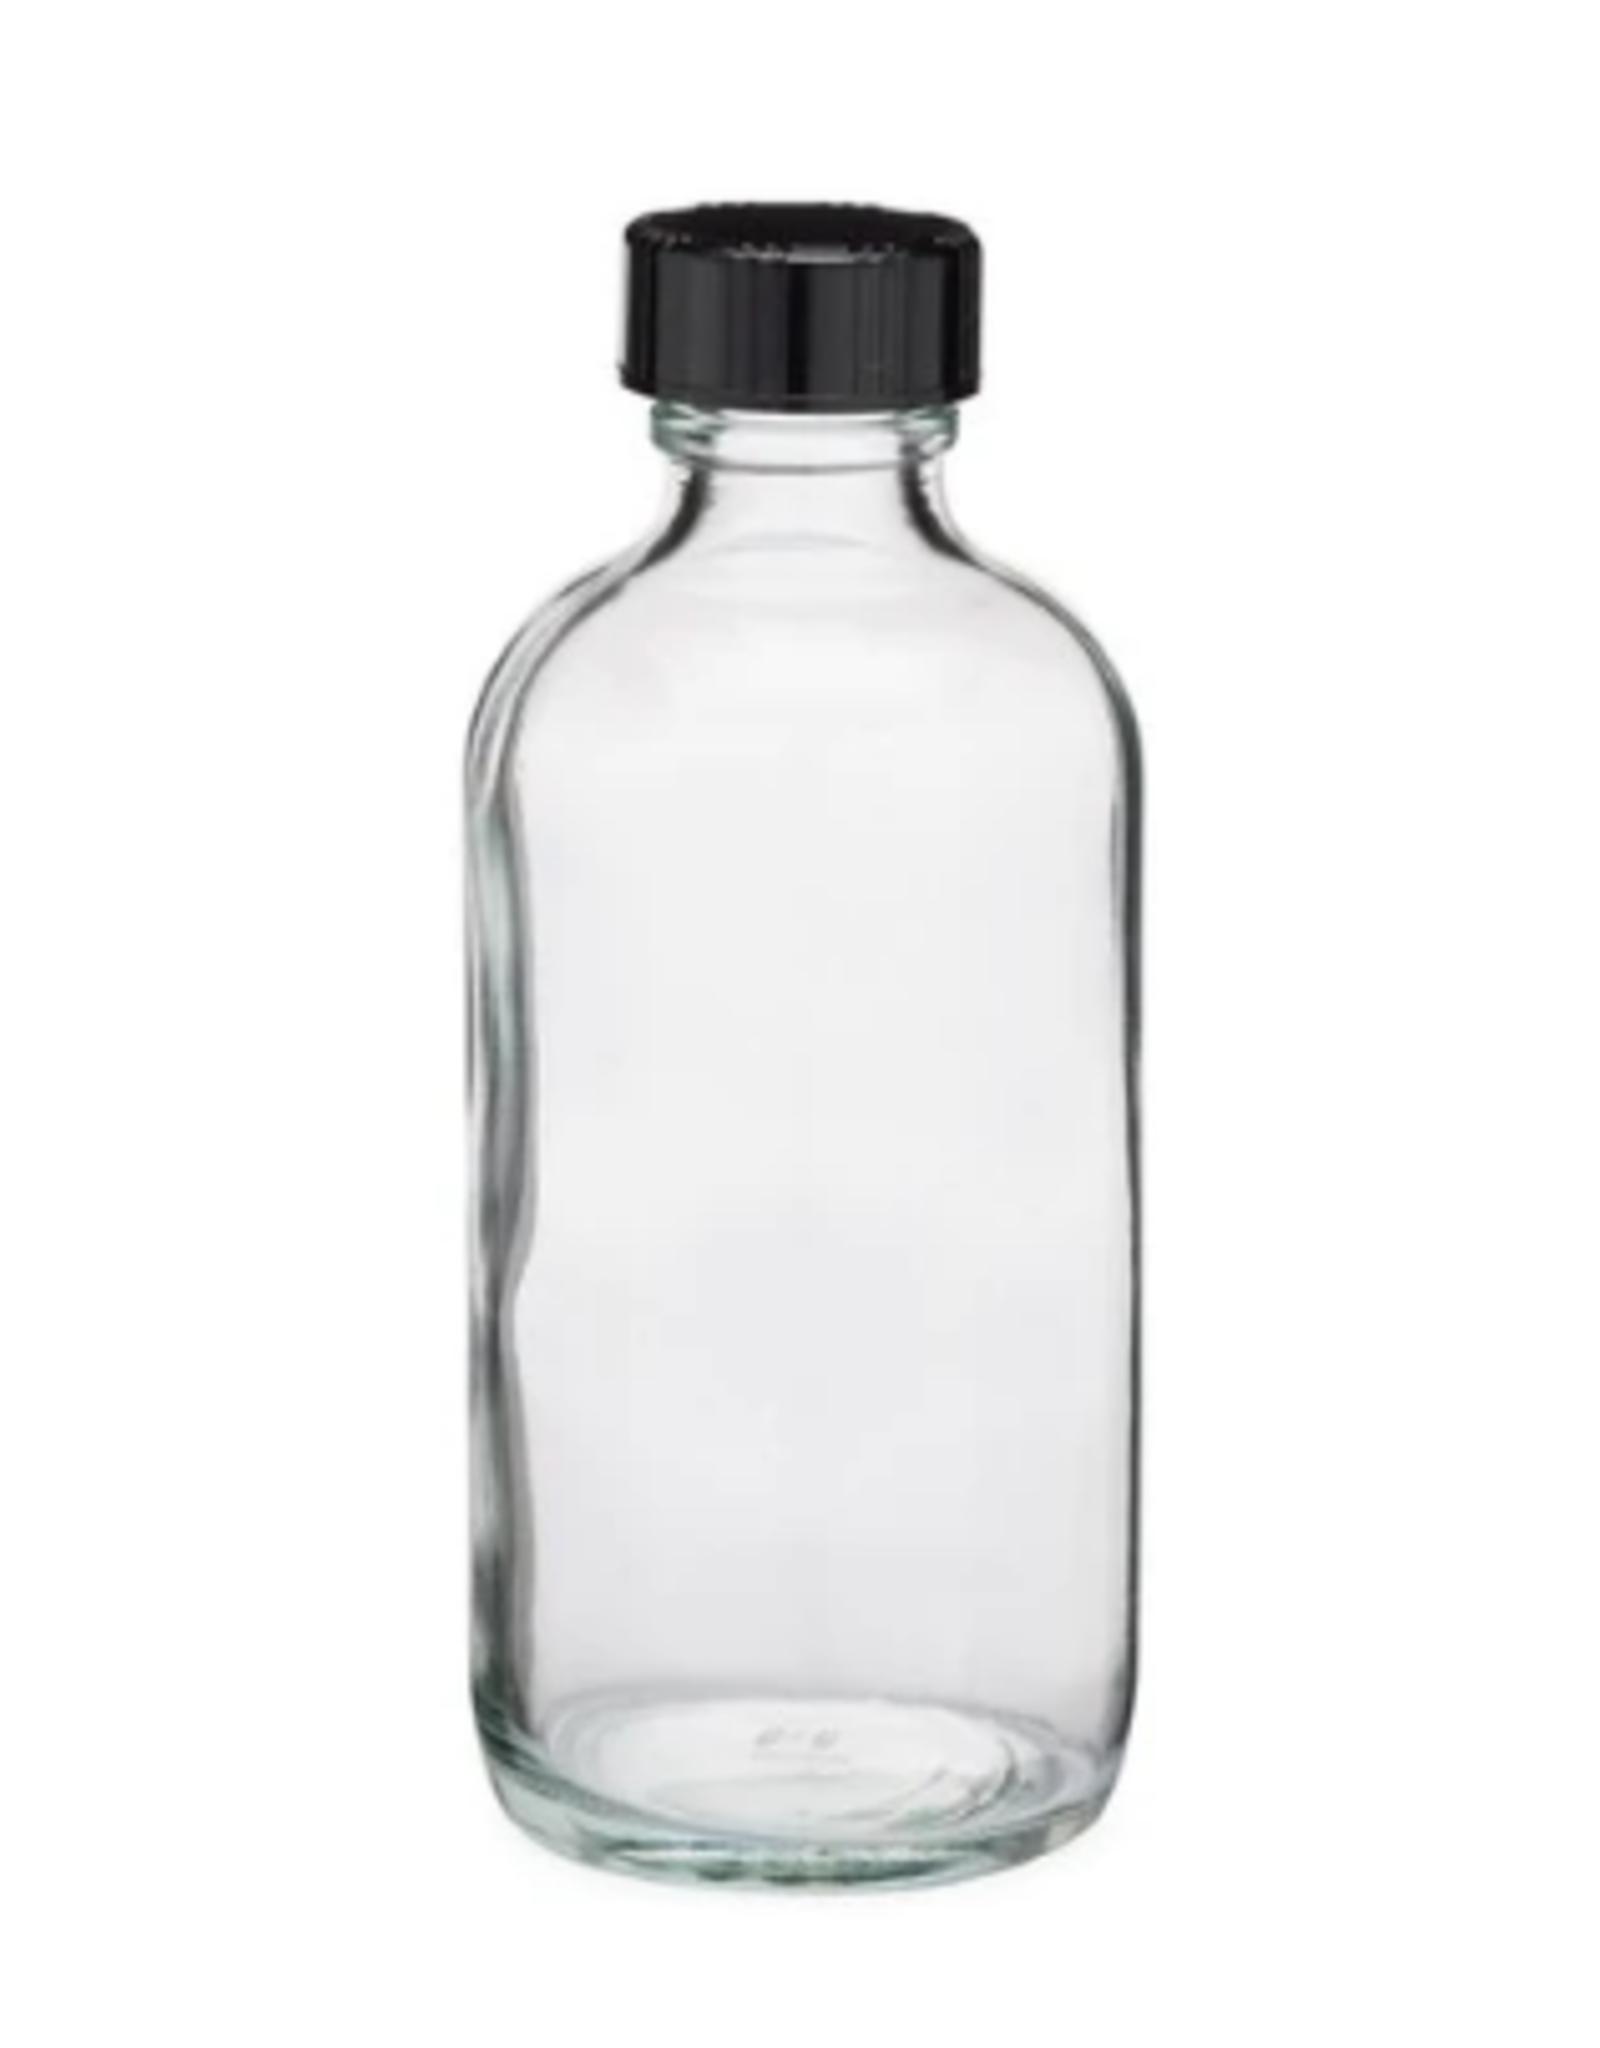 4 oz Clear Glass Bottles w/ Black Cap